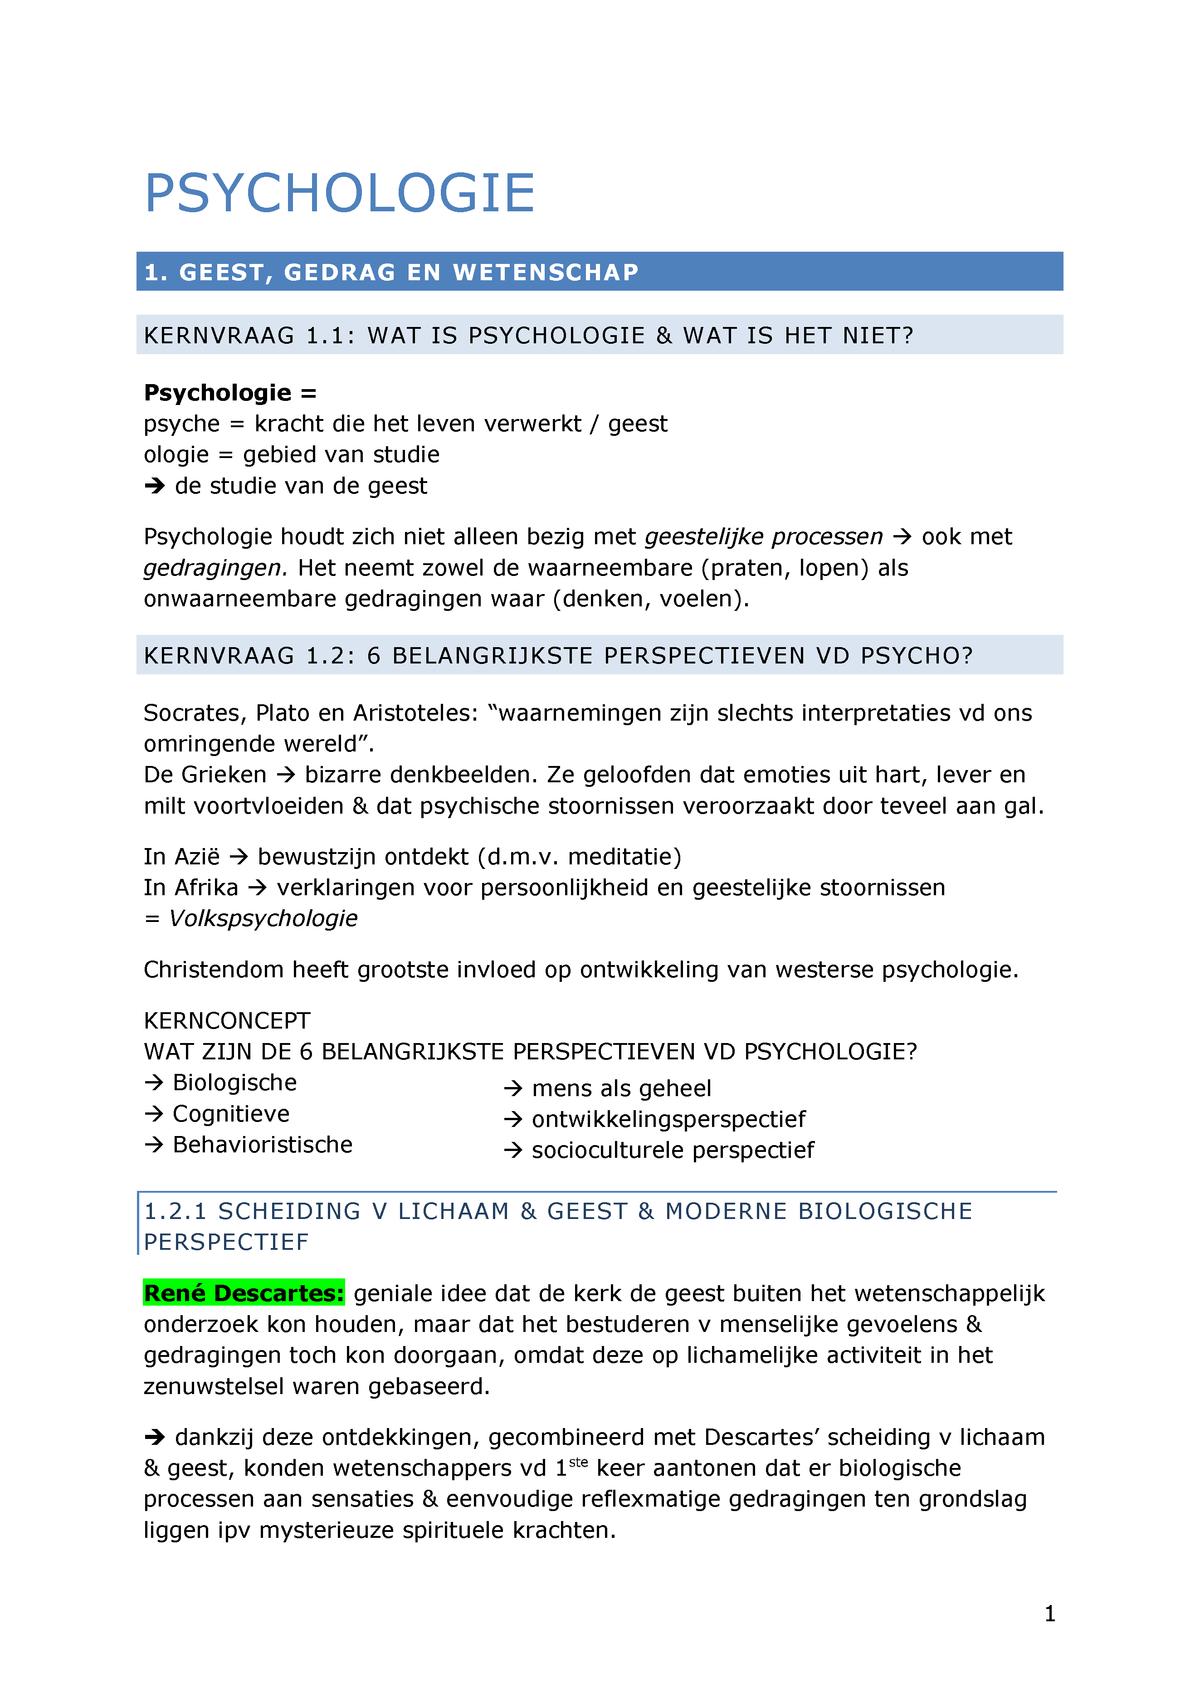 Samenvatting Psychologie de Essentie - Psychologie - StuDocu